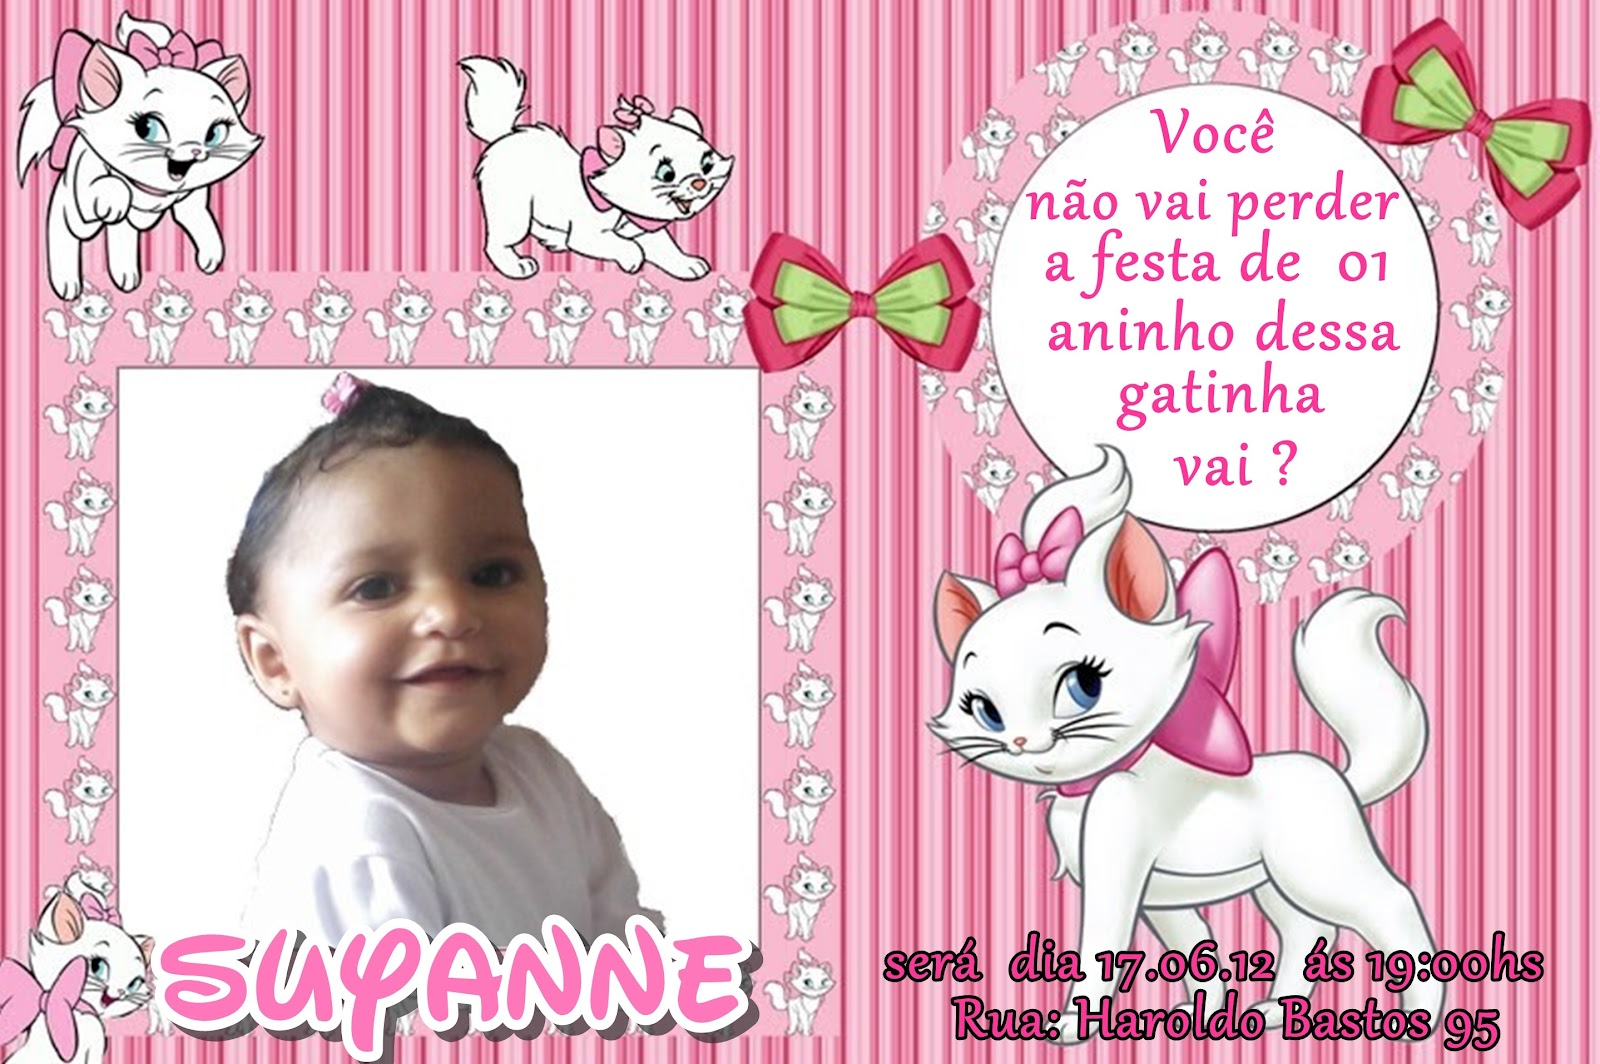 Convite De 01 Aninho Da Suyanne